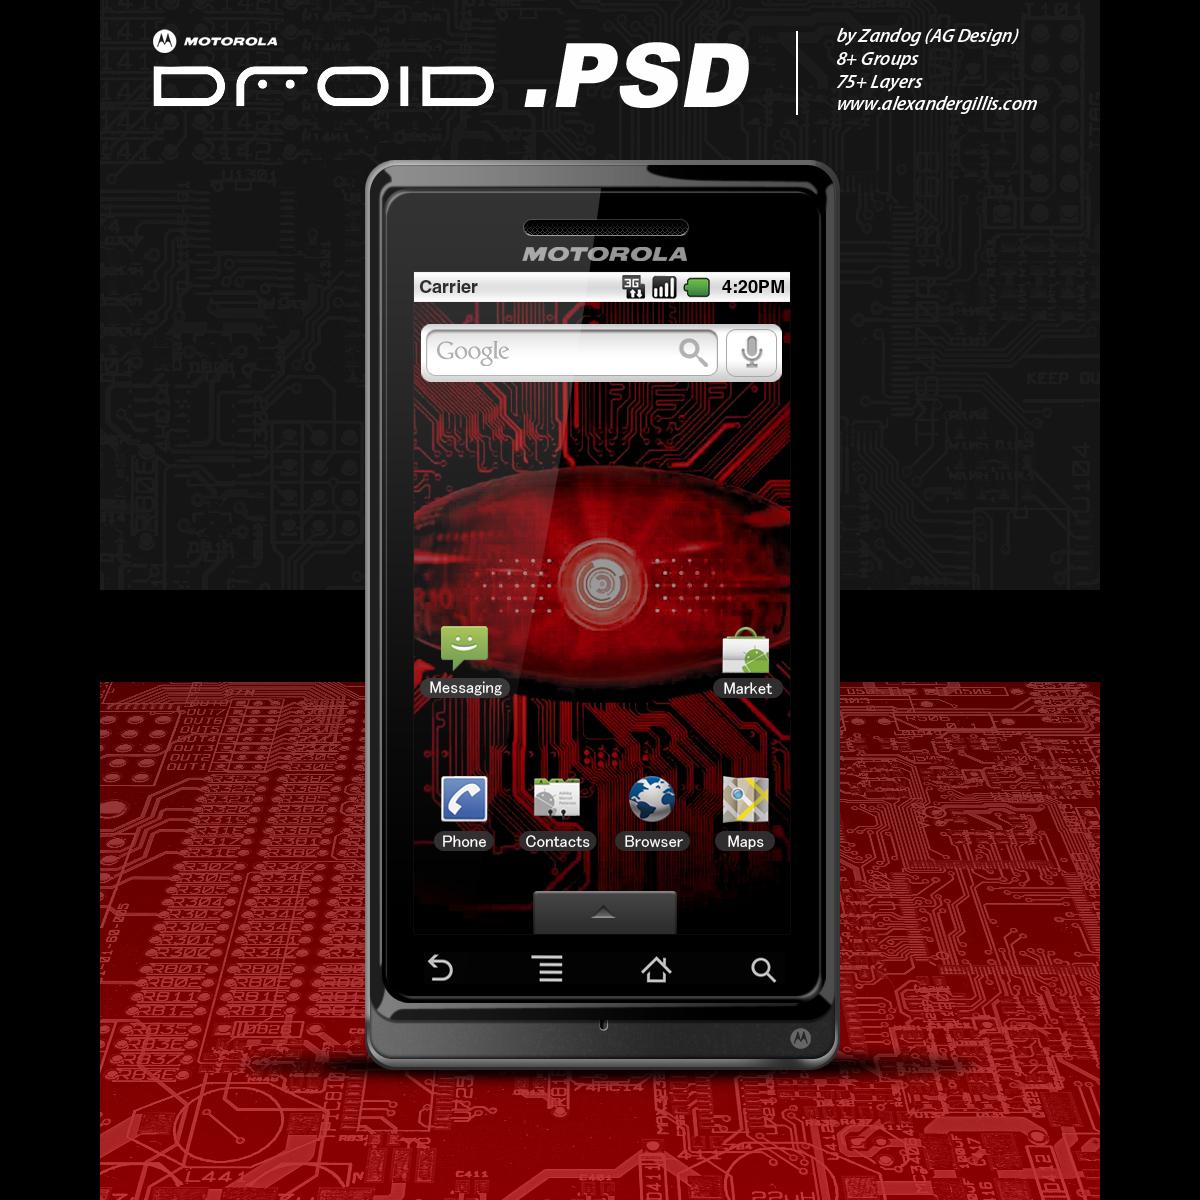 Motorola Droid .PSD